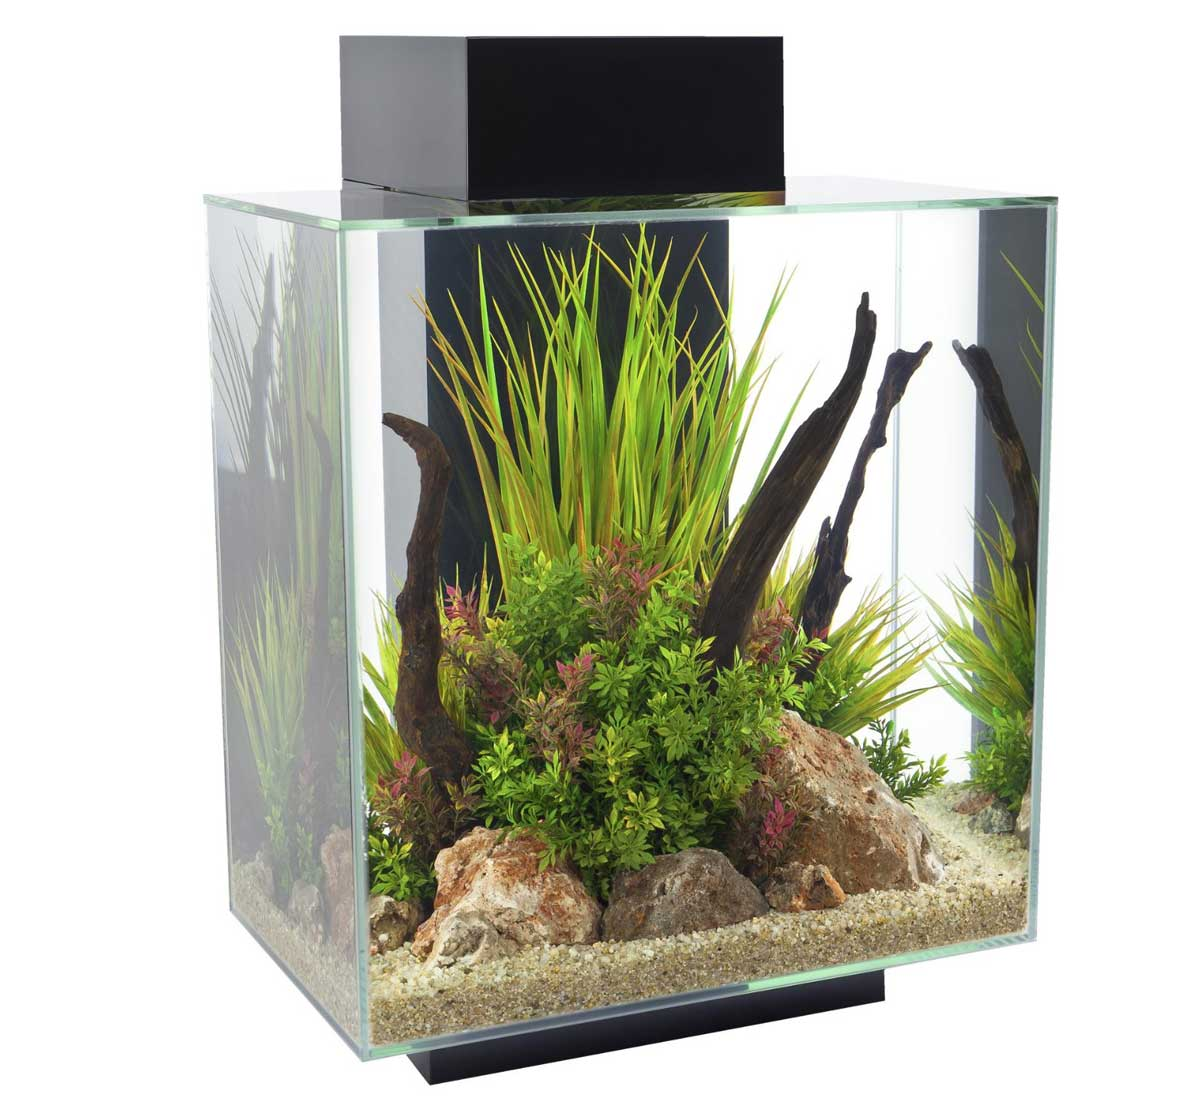 Fluval edge aquarium set led black 46ltr aquariums for Where to buy fish online